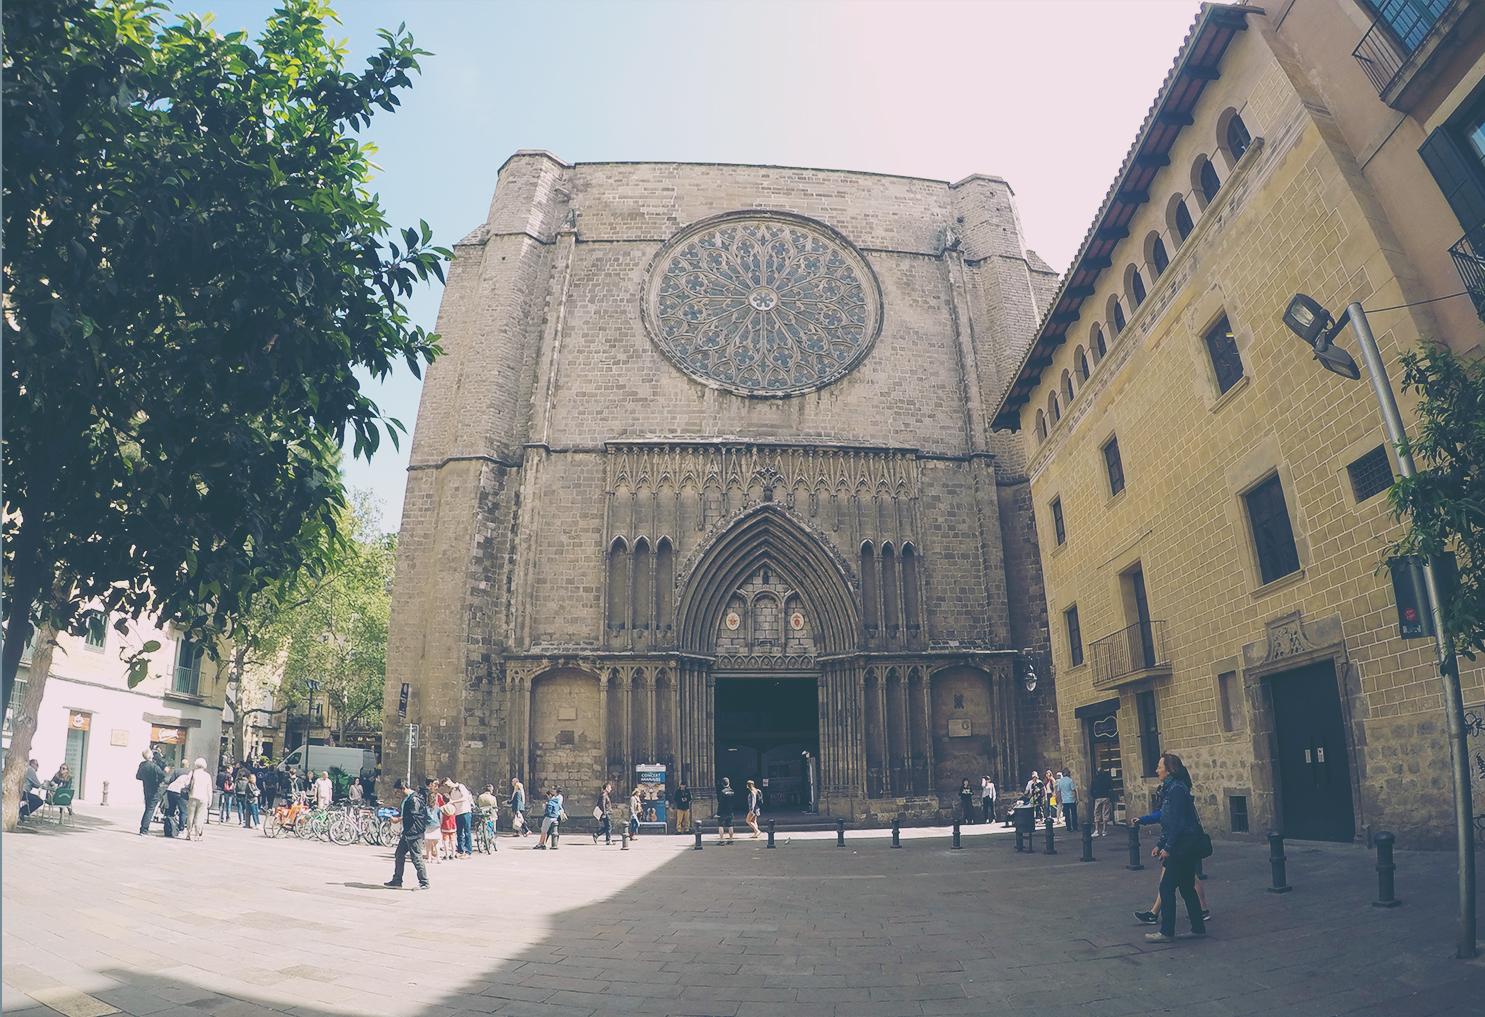 Ghotic Quarter La Rambla (1)